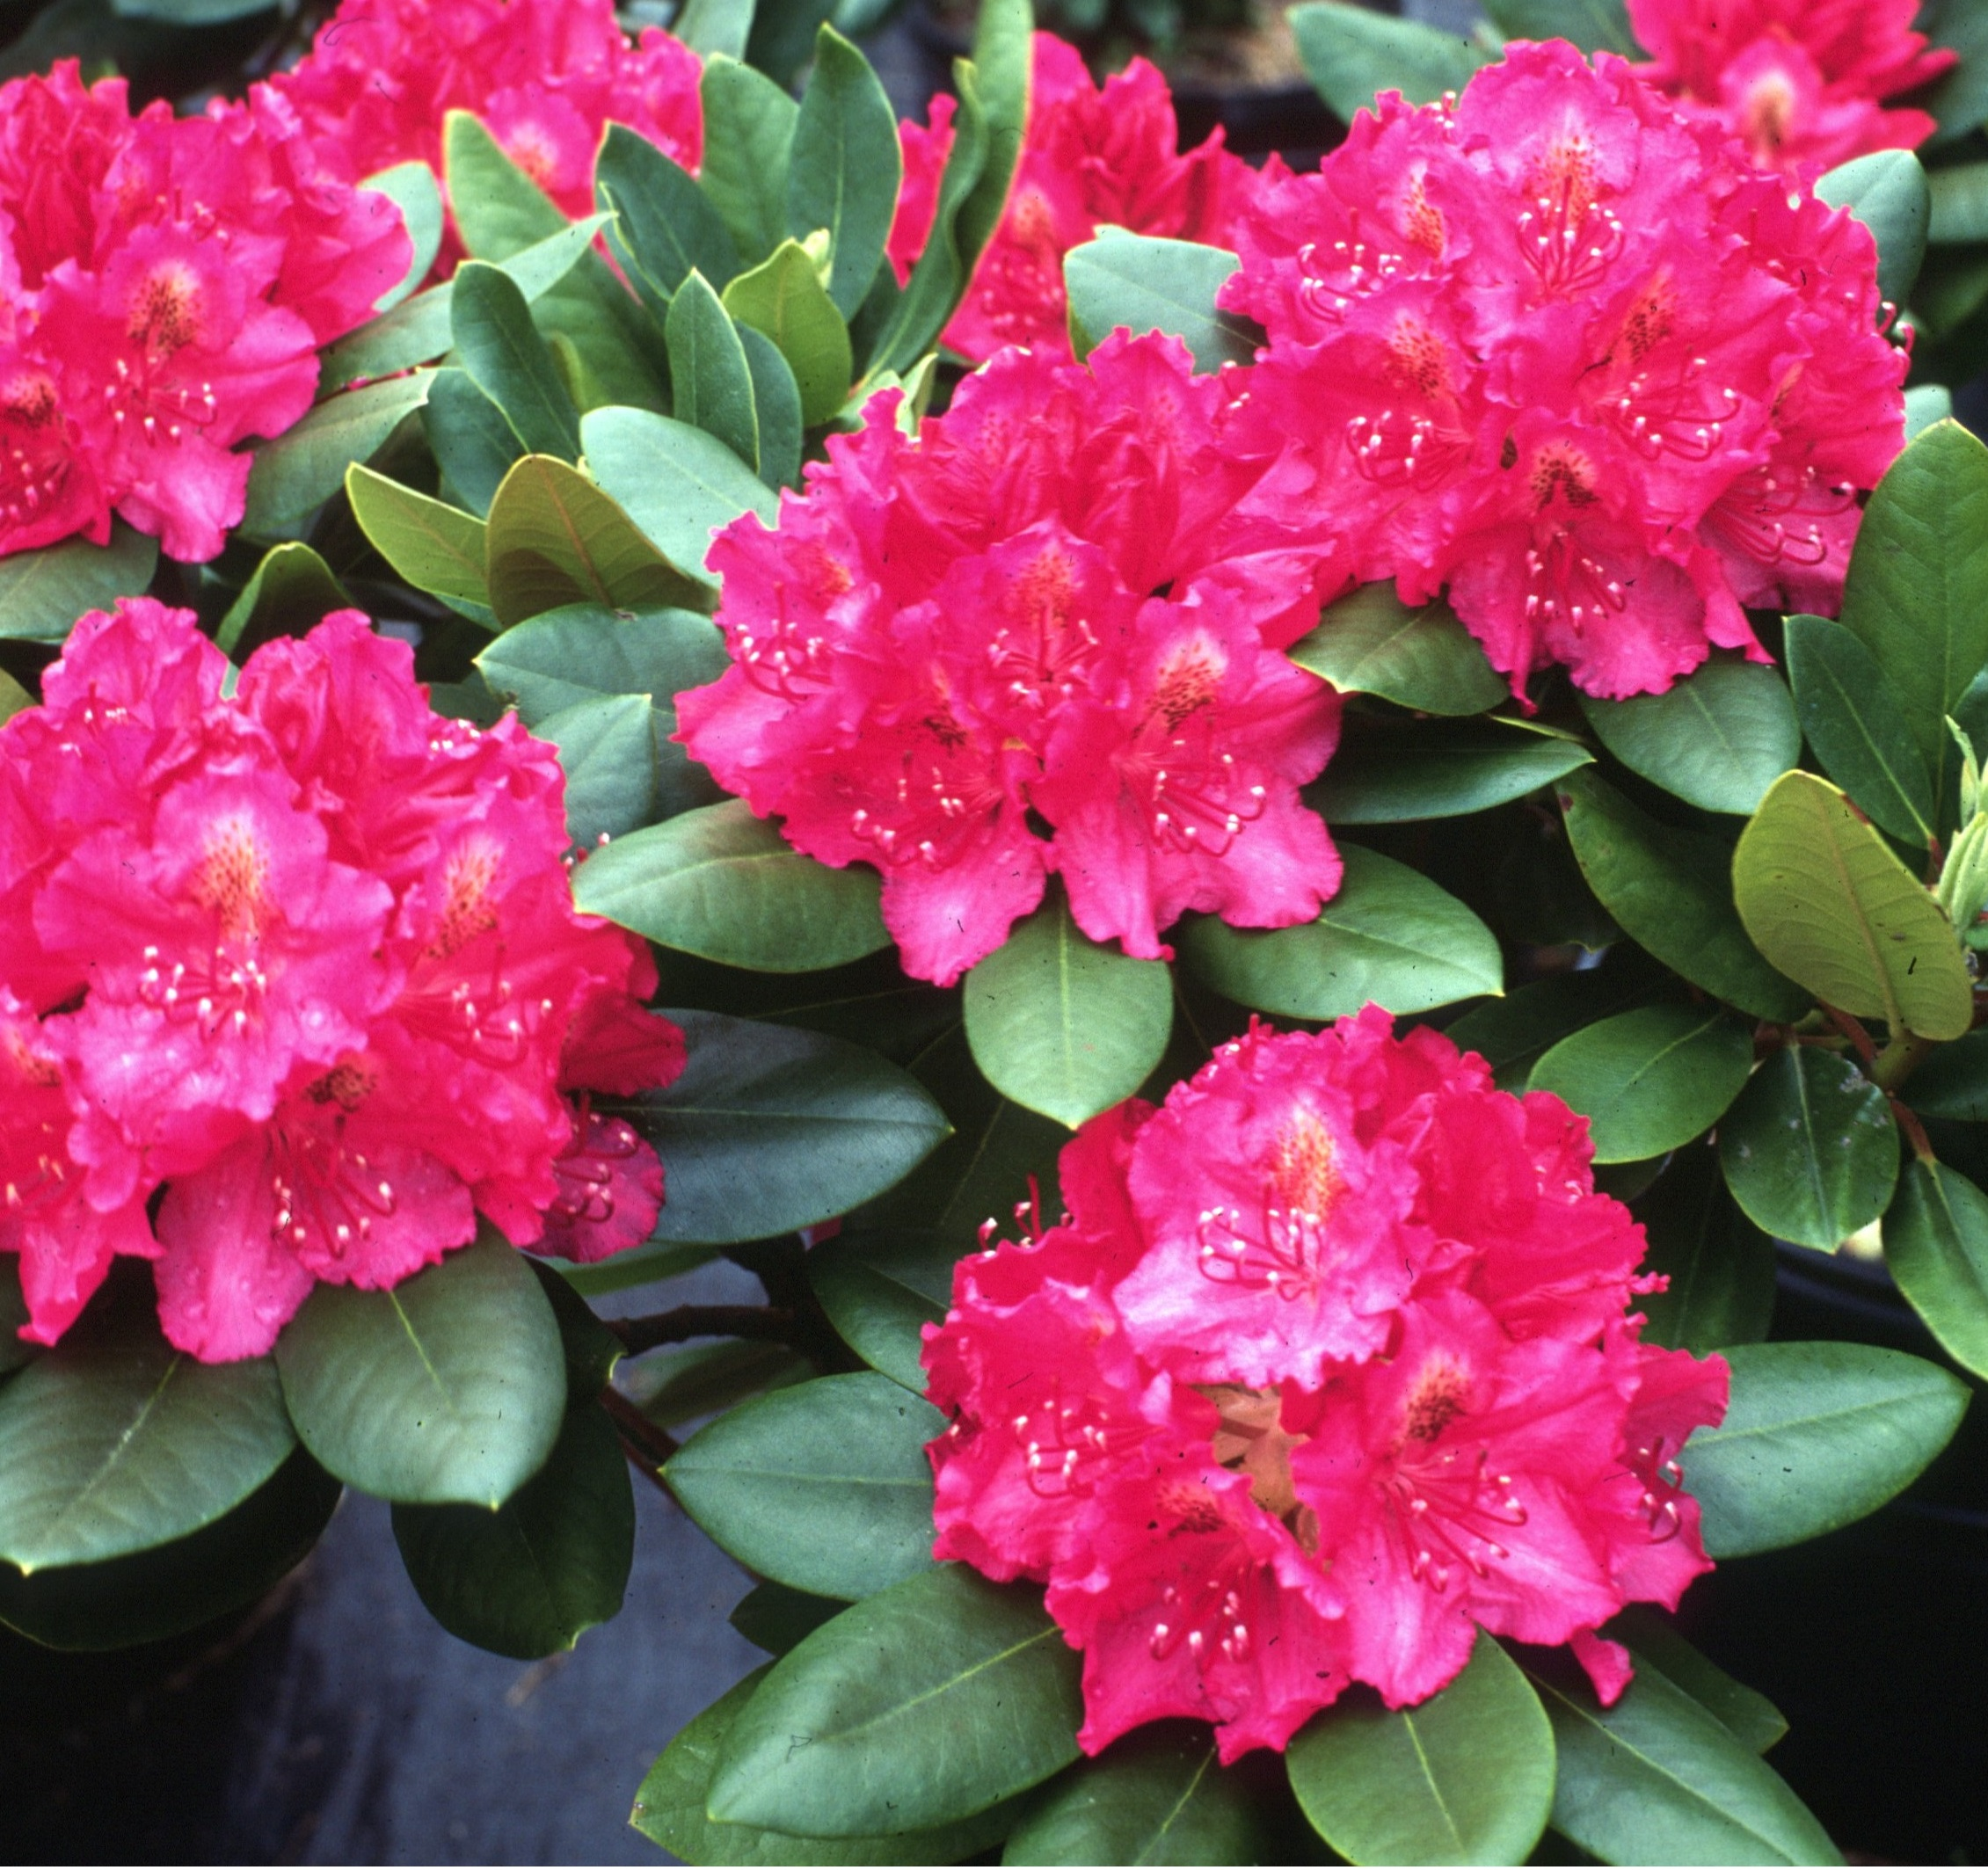 Pearce S American Beauty Rhododendron Monrovia Pearce S